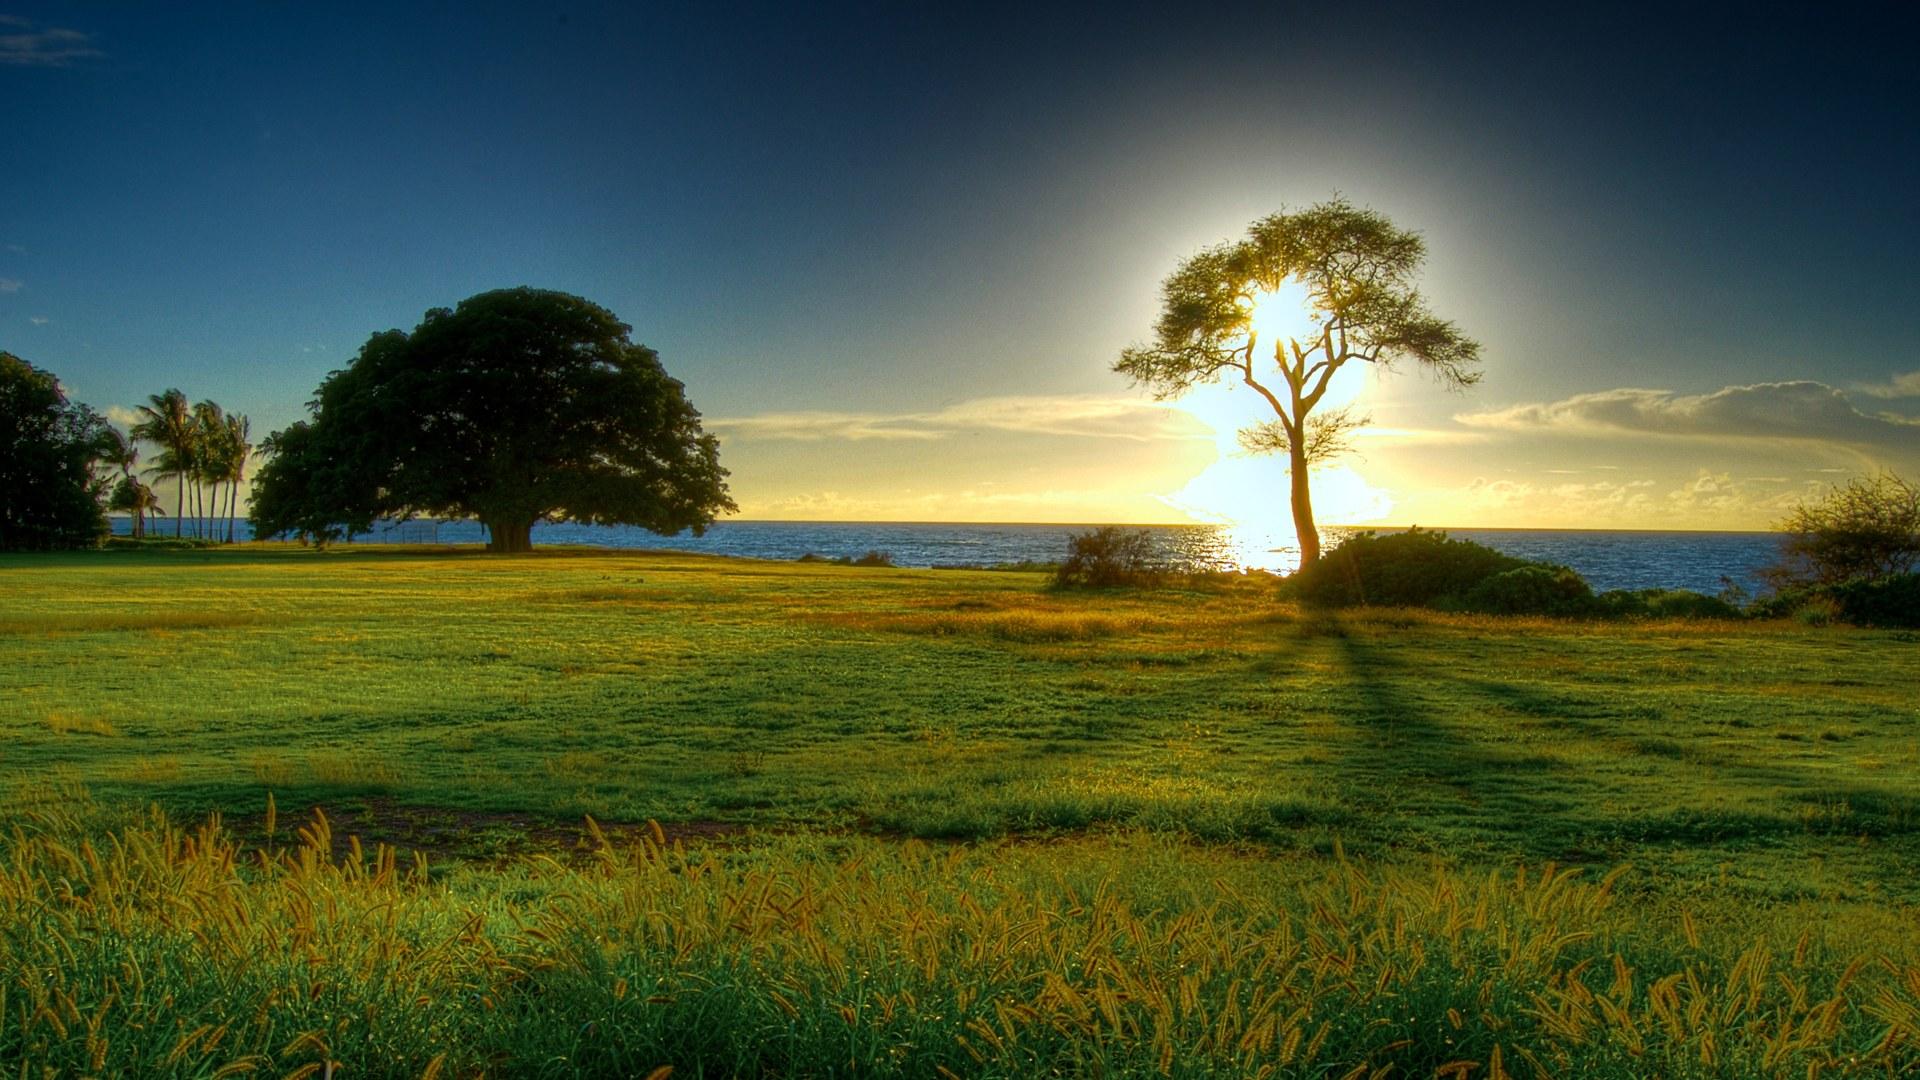 Landscape HD Wallpapers 1080p